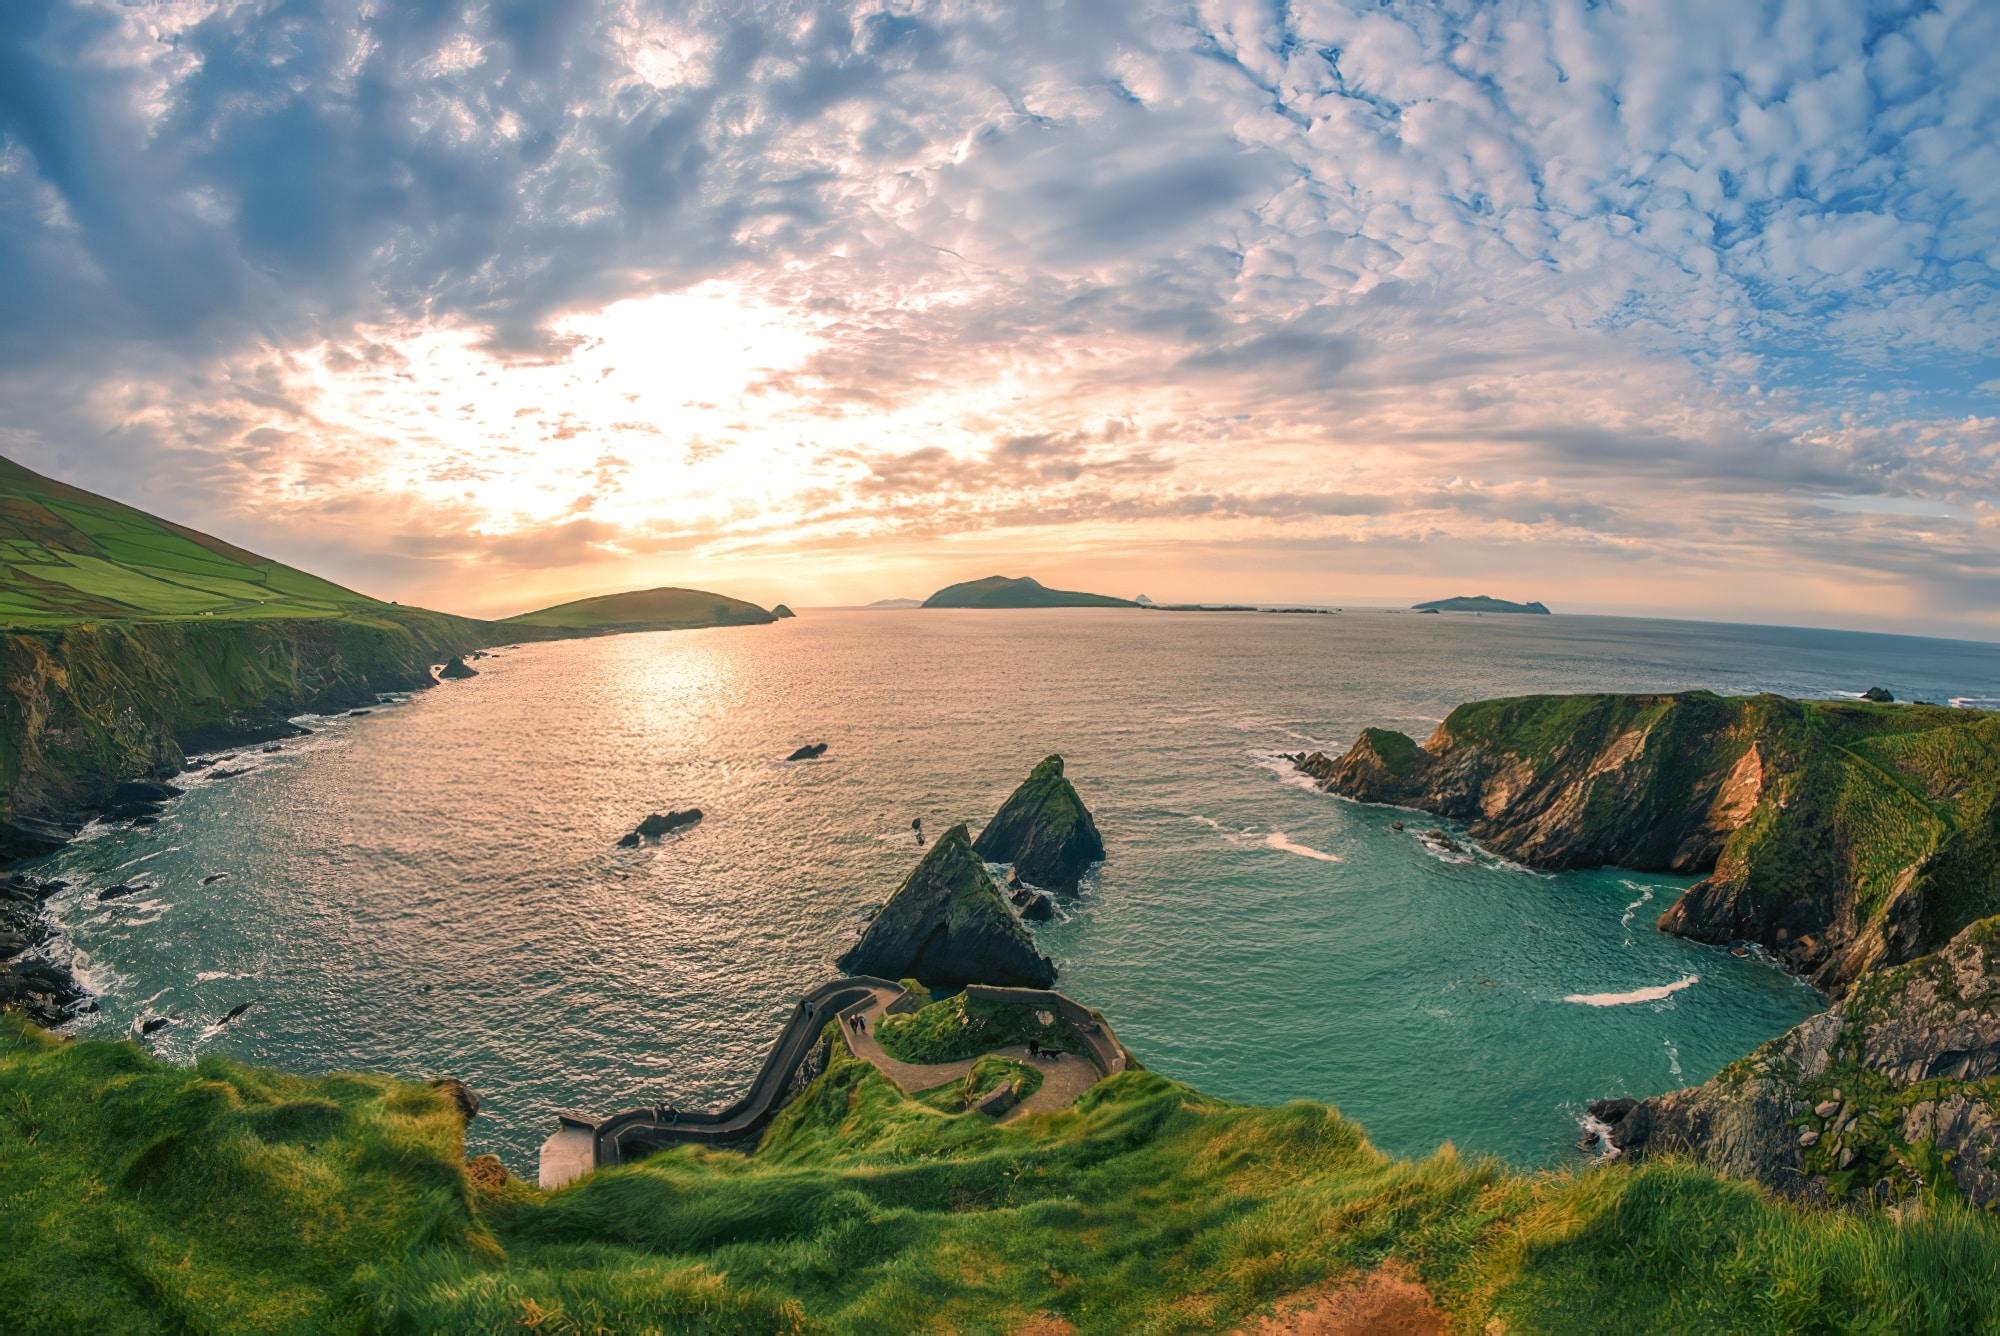 Meilleure période pour partir en Irlande